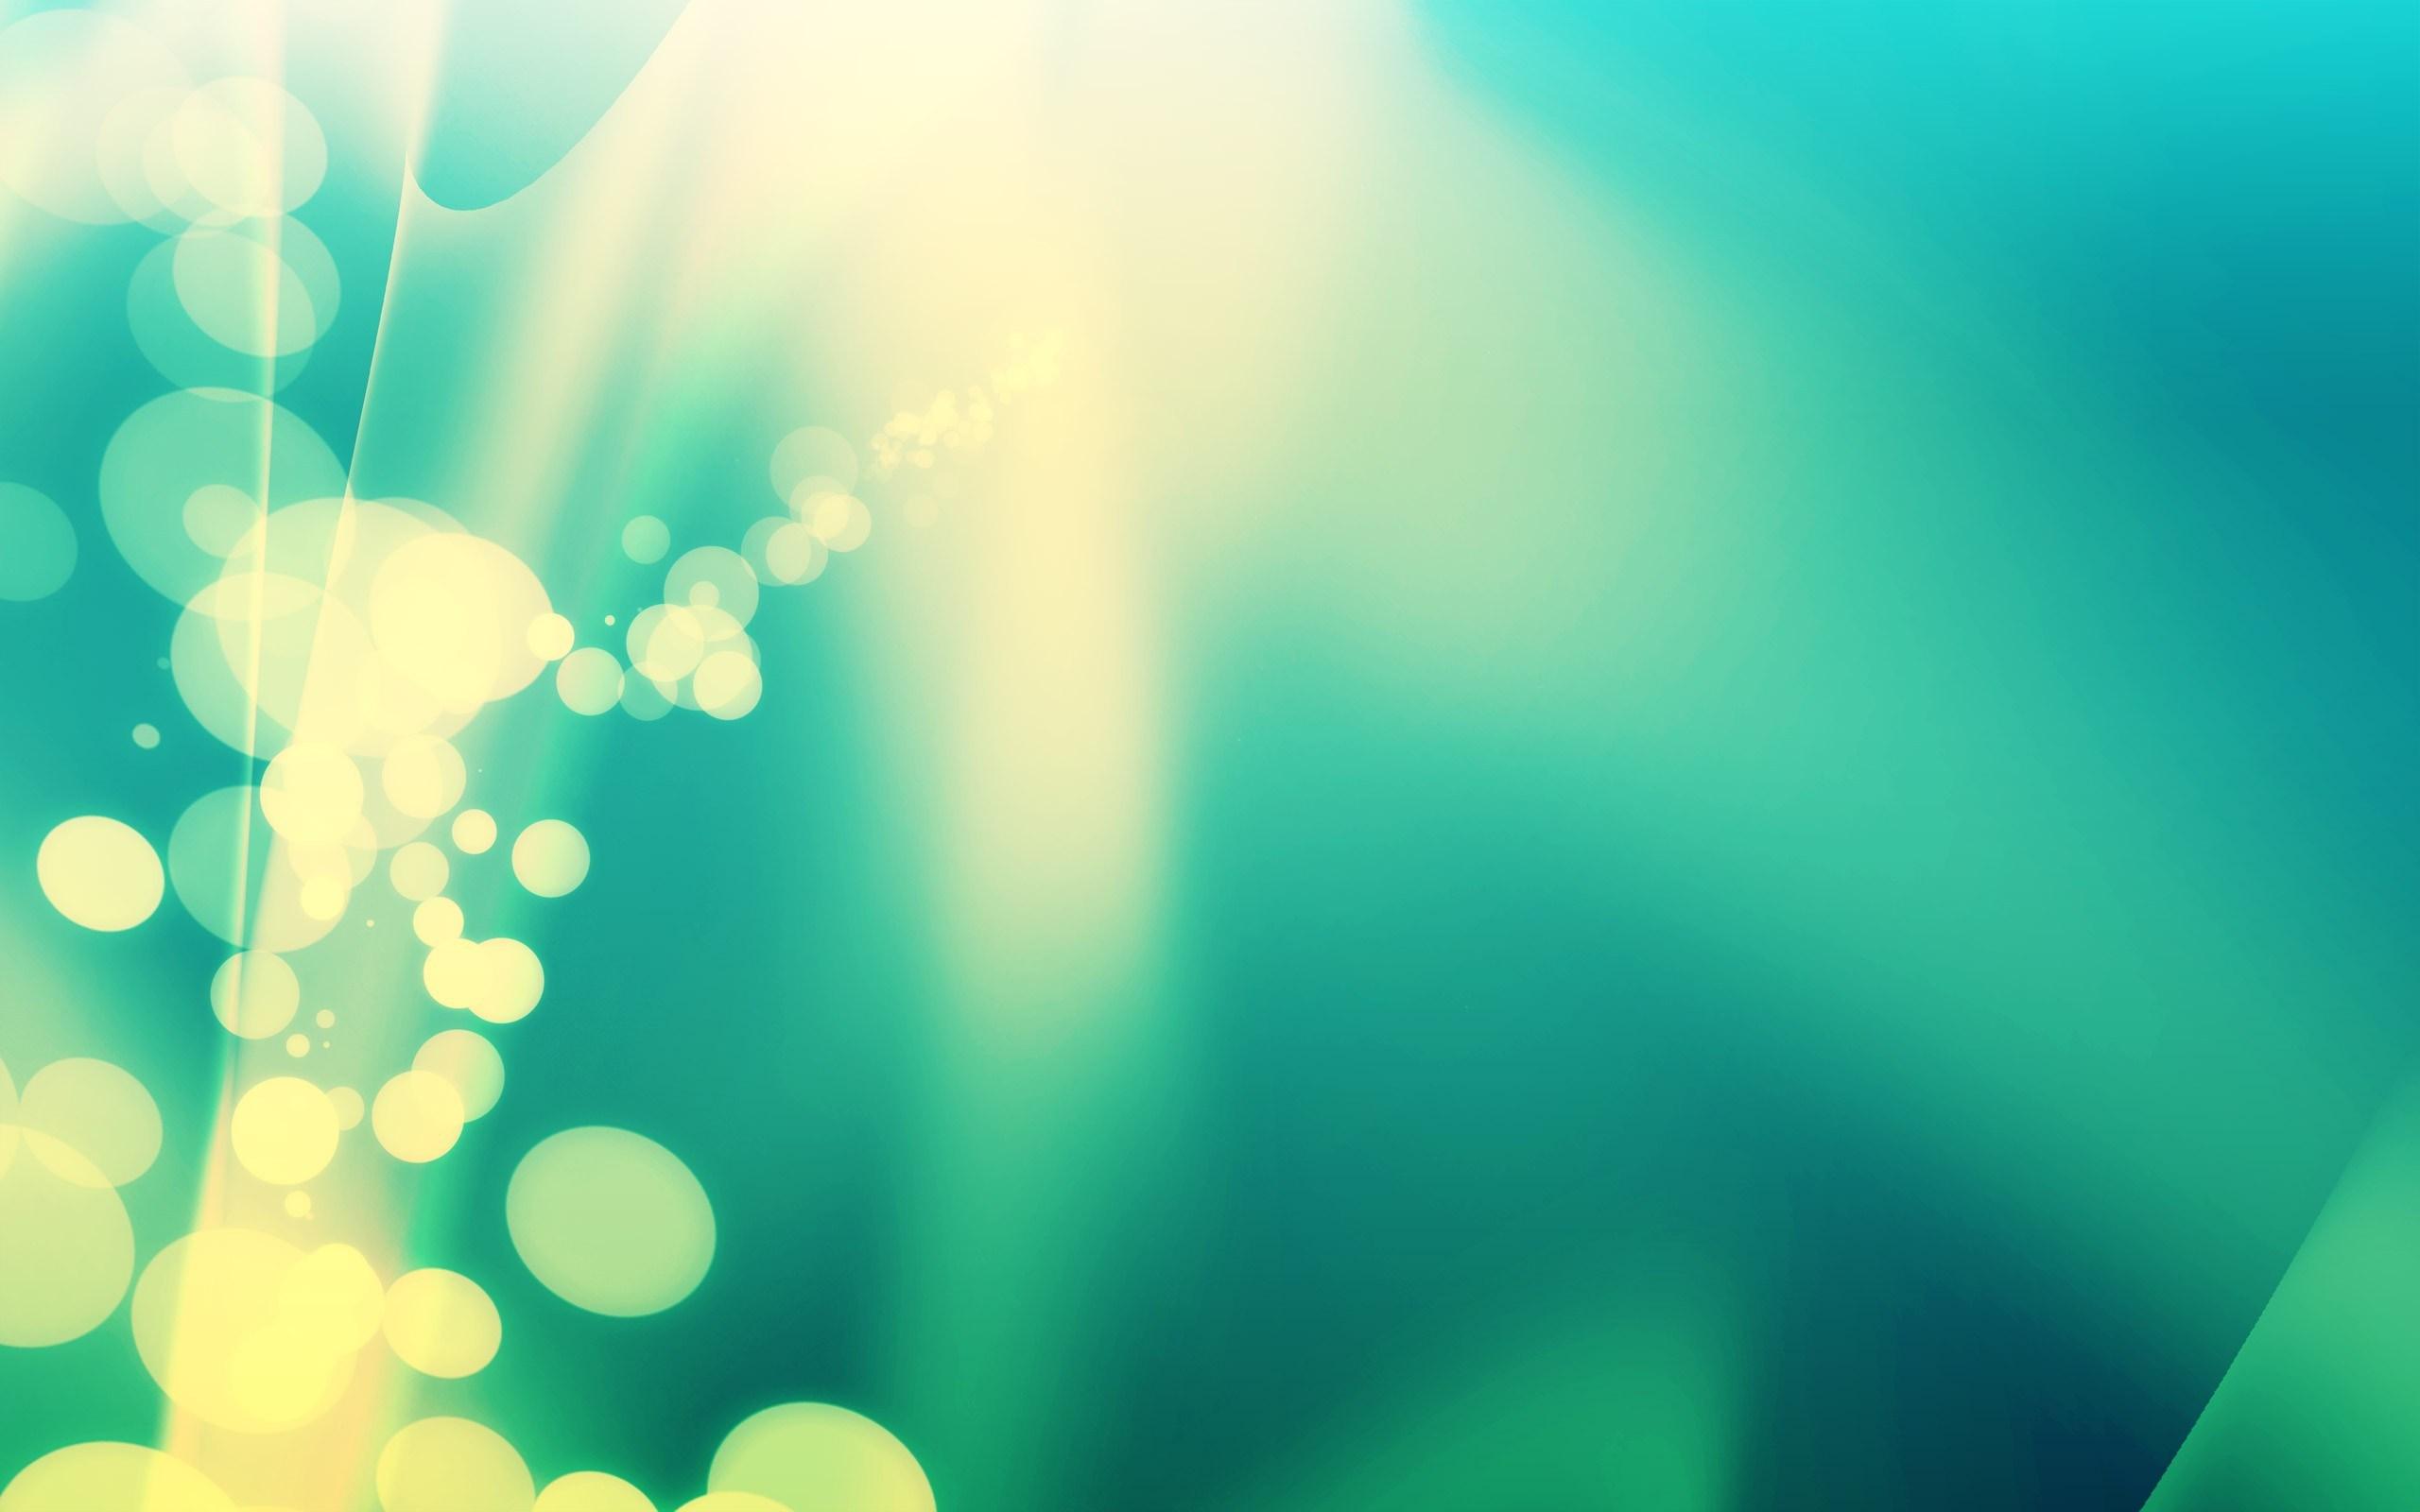 Green Color Stream desktop wallpaper 2560x1600